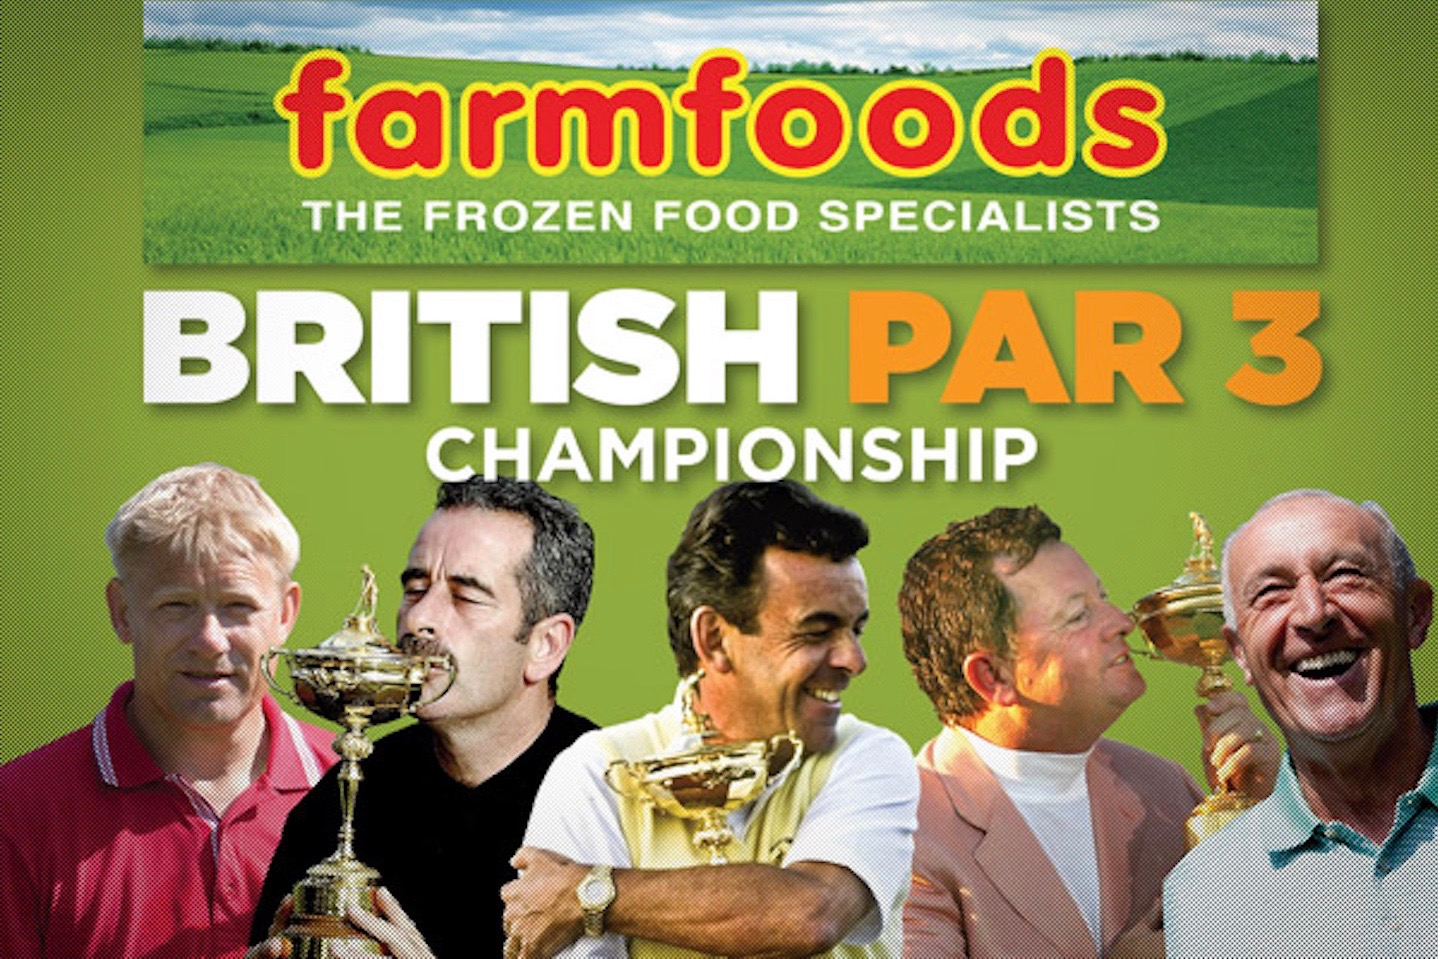 The Farm Foods British Par 3 Championship kicks off